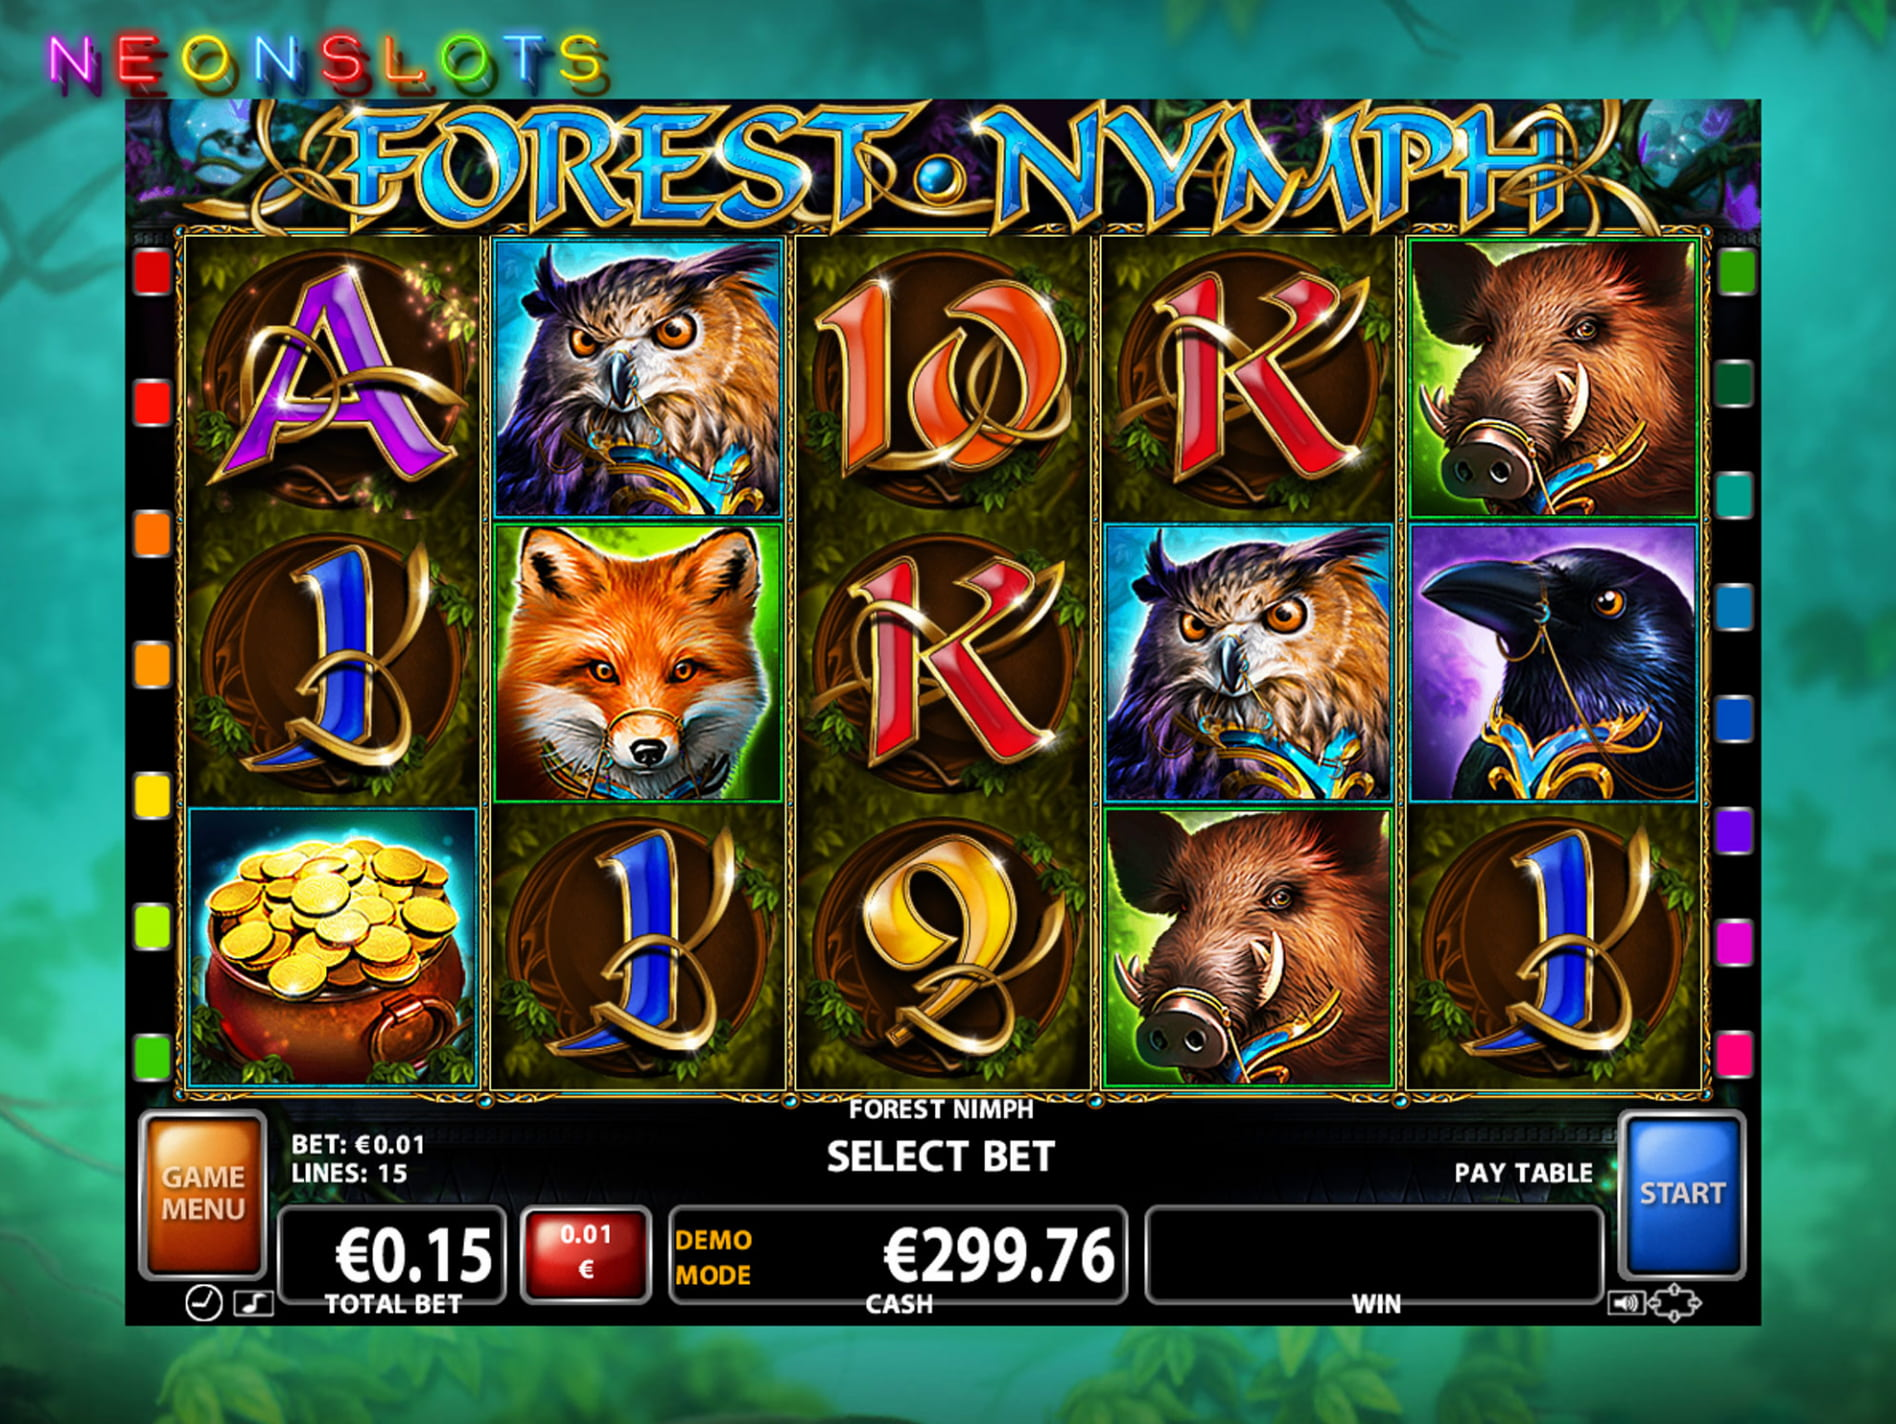 Juegos tragamonedas gratis piramide lista casino bonos-119956